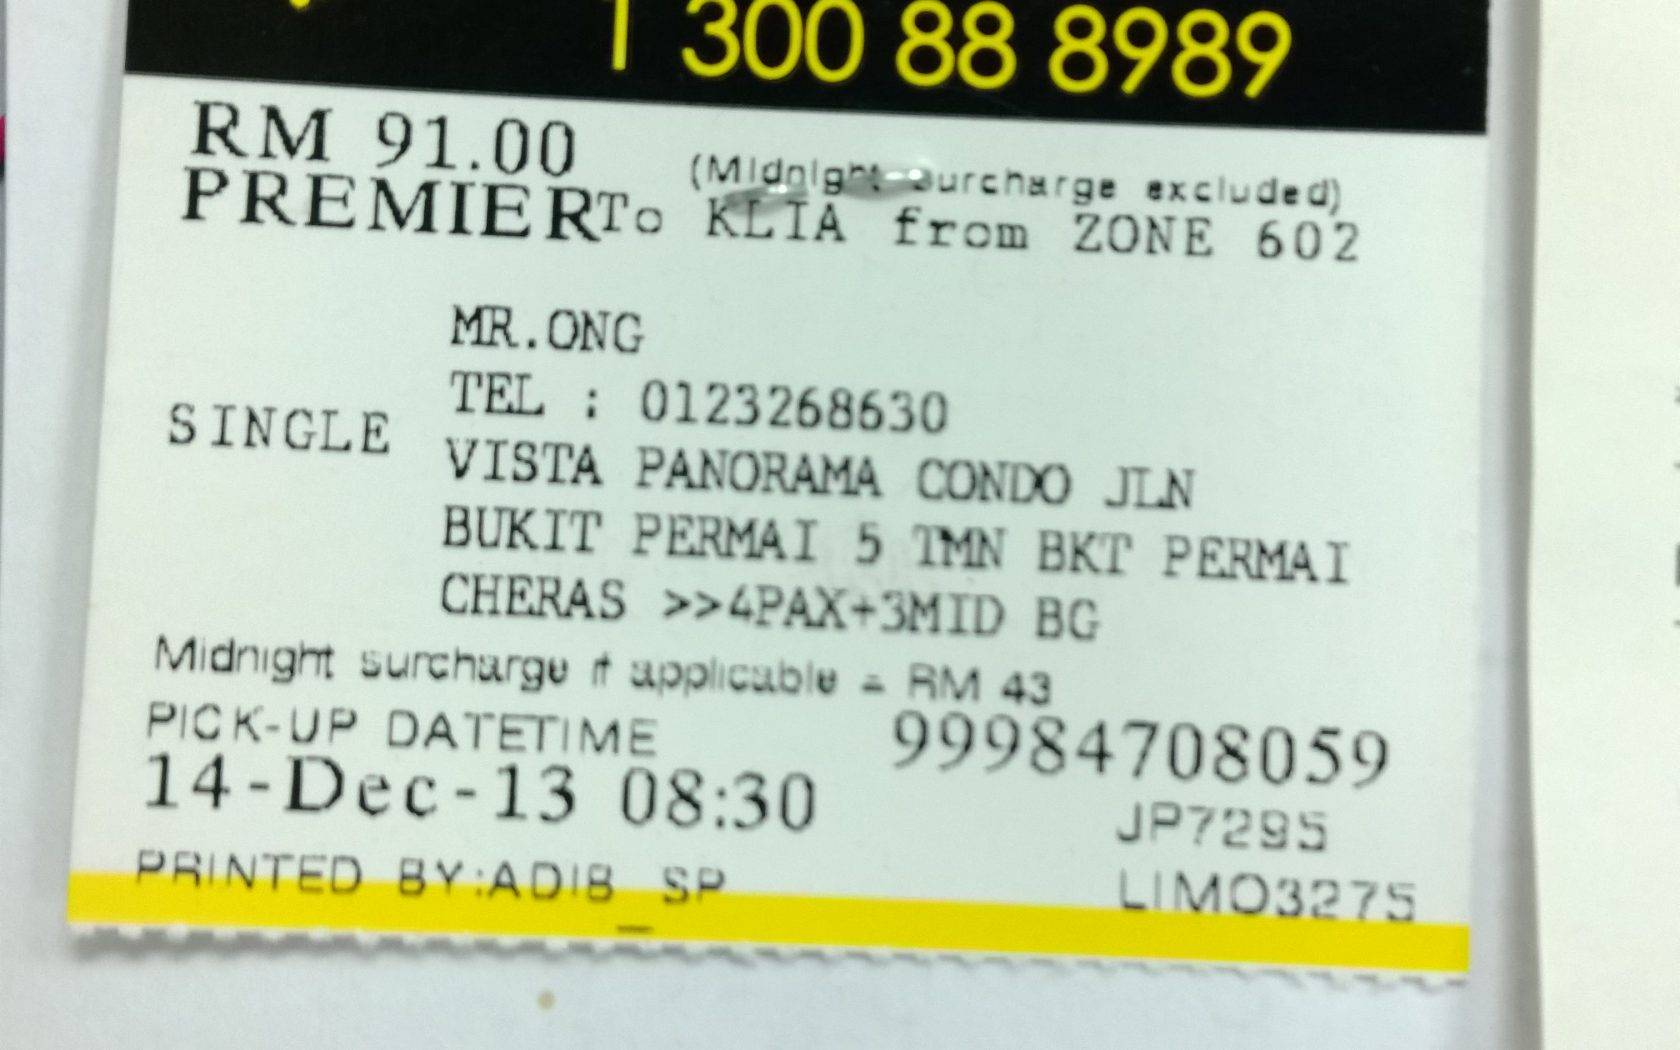 Taxi Receipt Template Malaysia